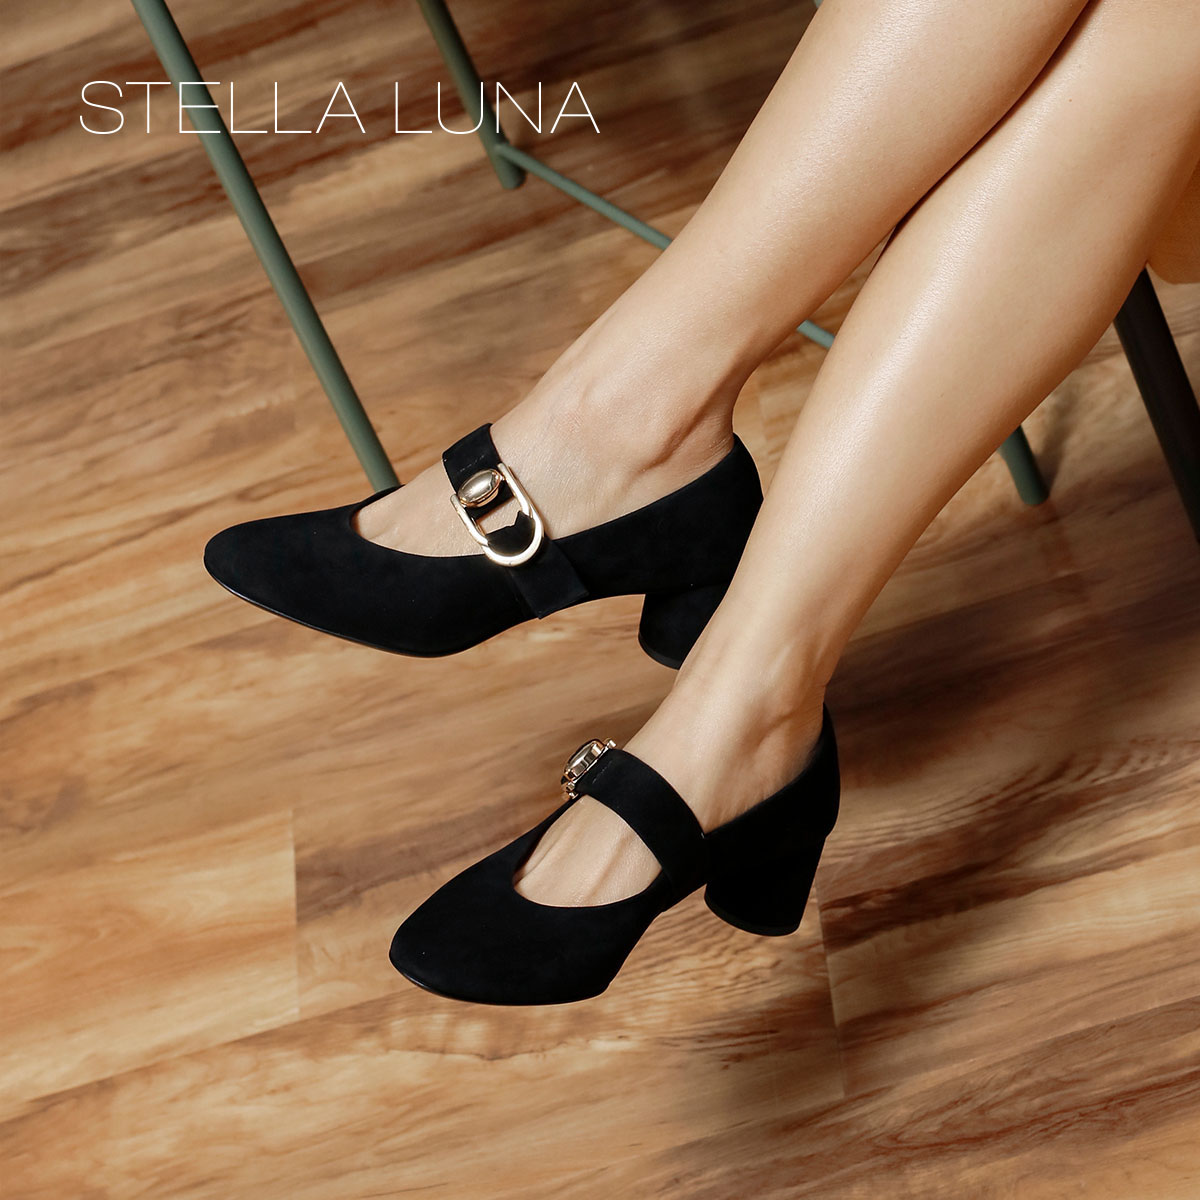 STELLA LUNA女鞋春季2018新款金属搭扣优雅浅口圆头中跟粗跟单鞋